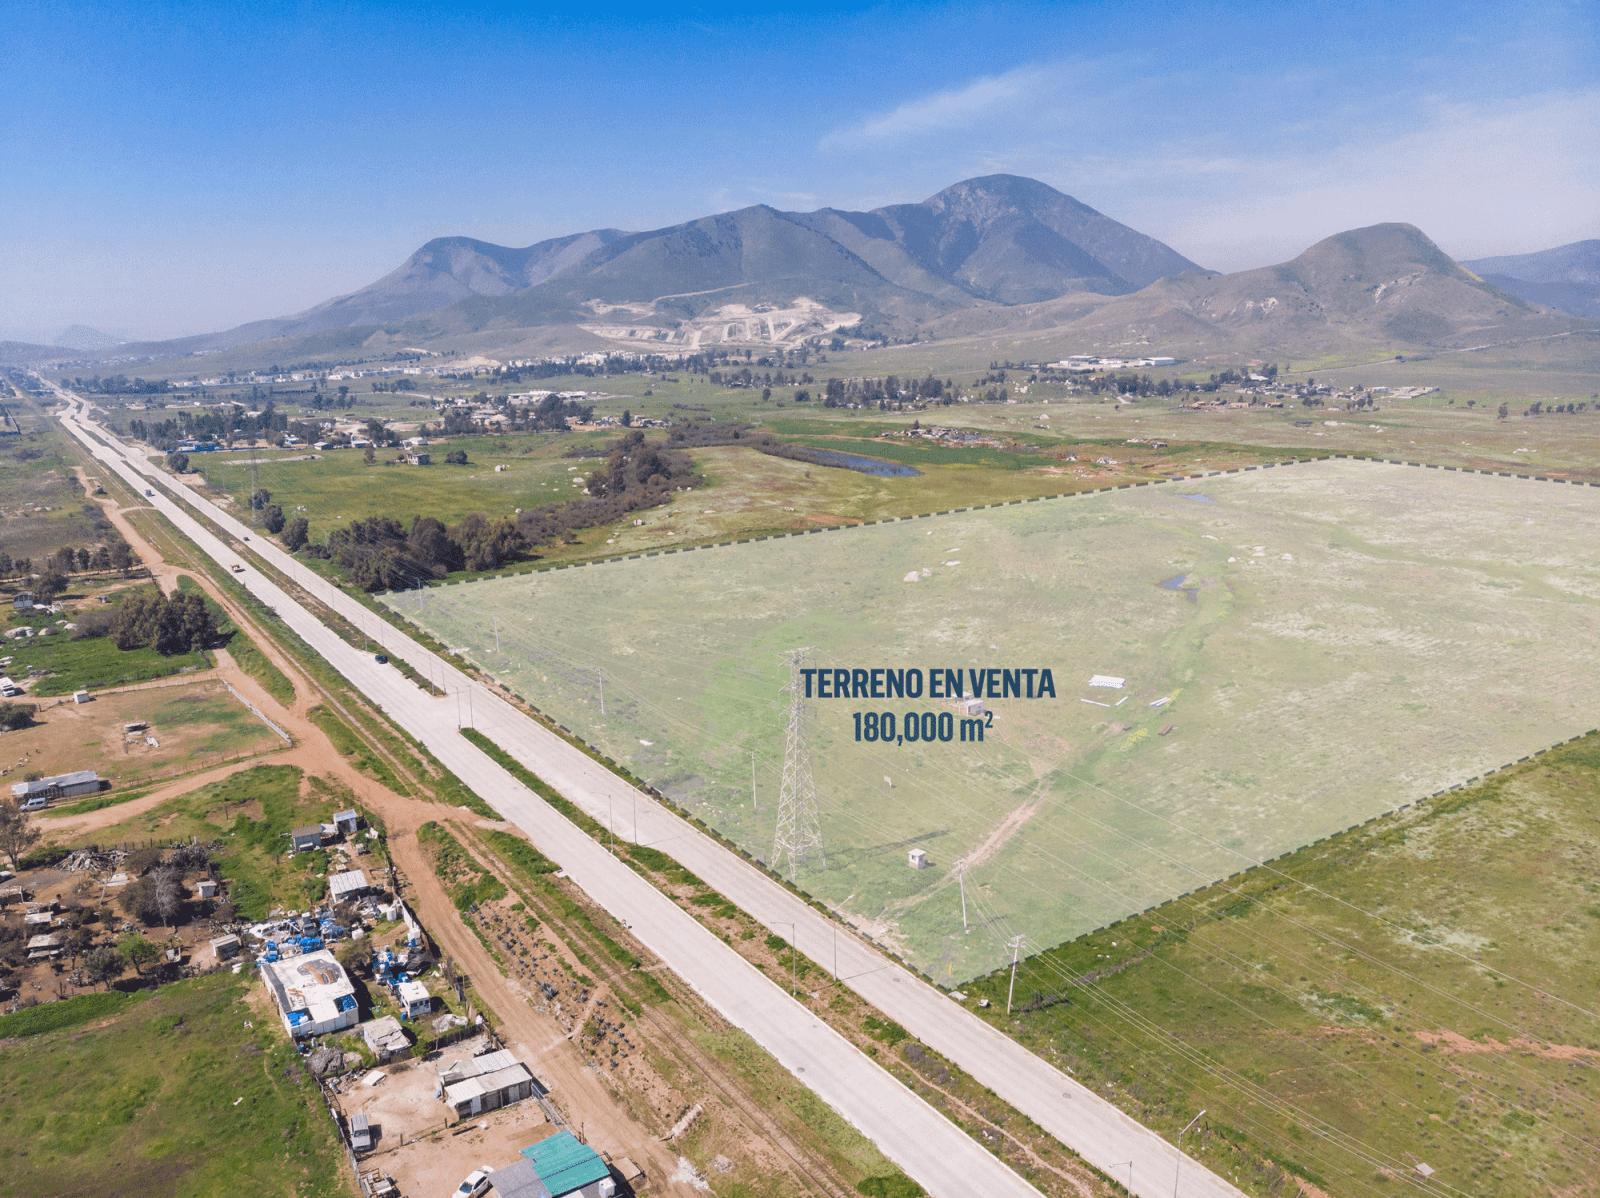 Vista detallada de Terreno industrial en venta en Tijuana, Baja California